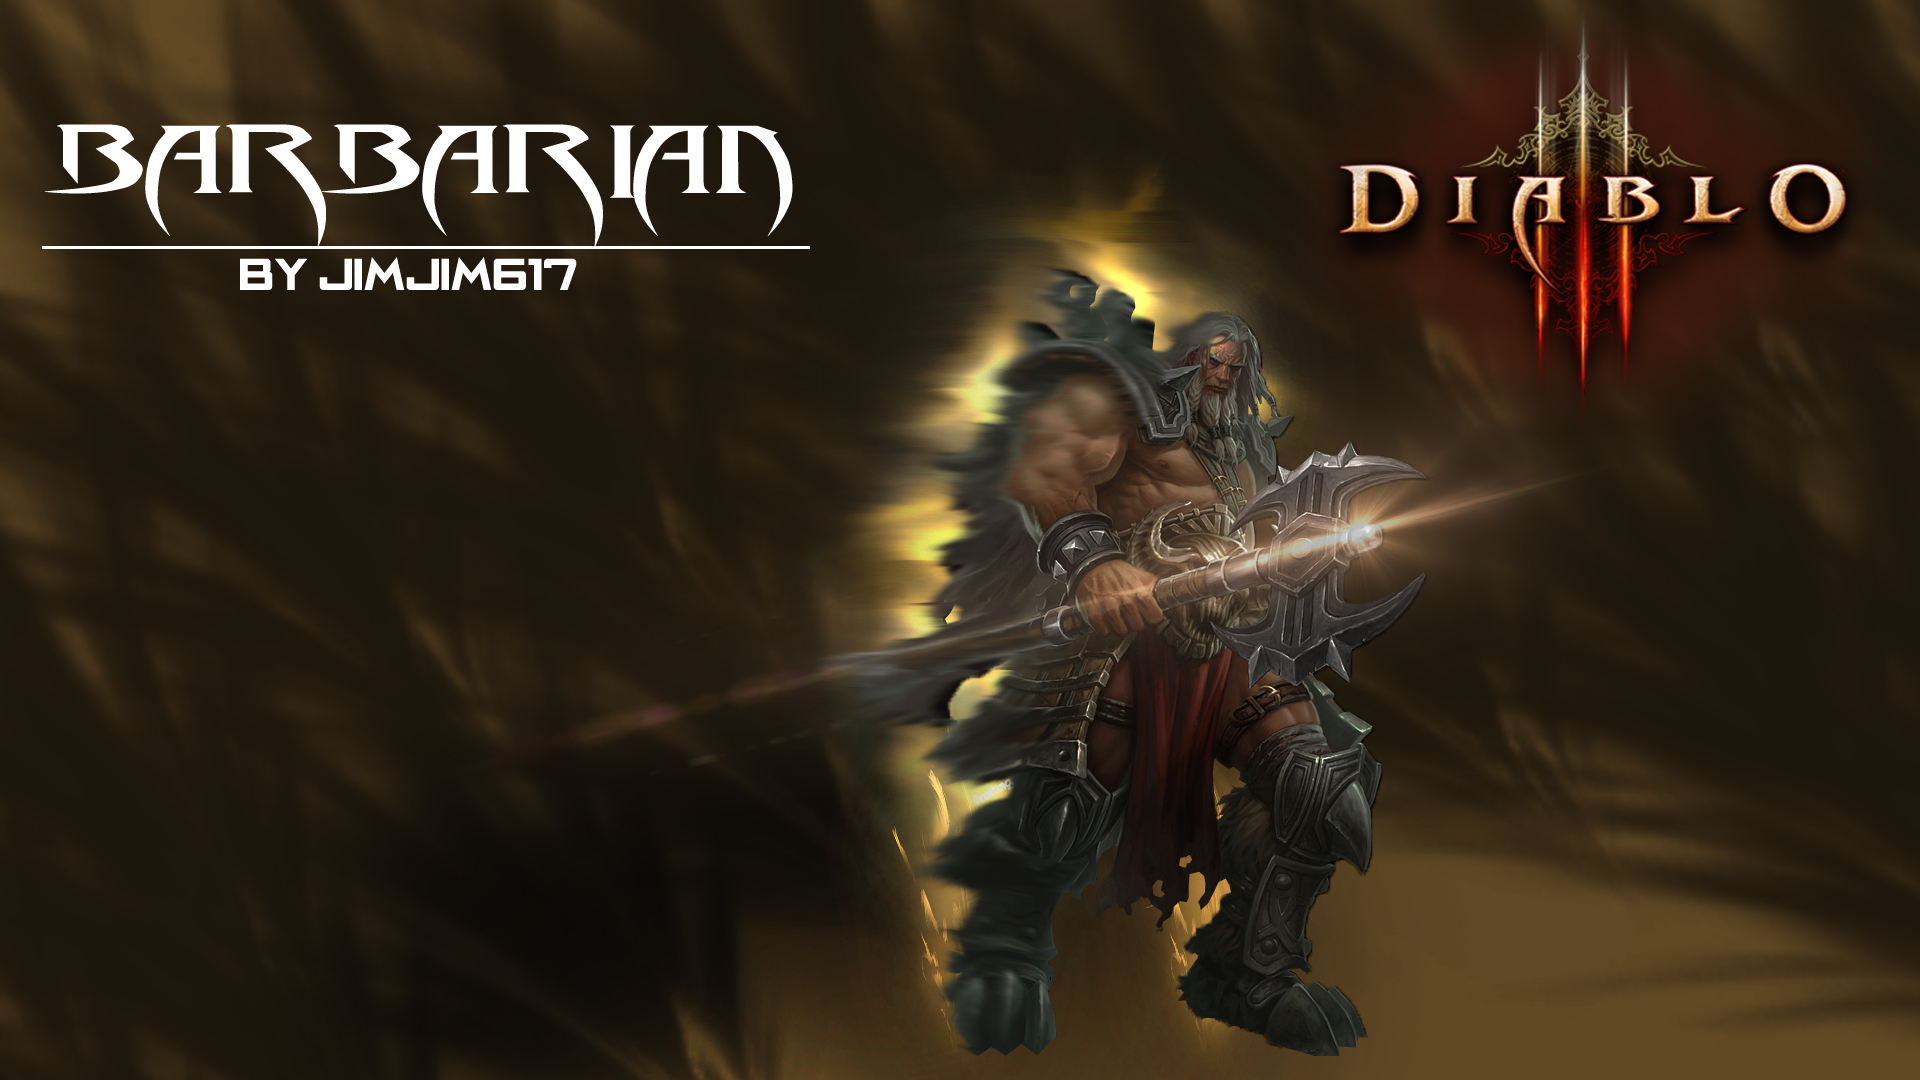 Diablo 3 1920x1080 Barbarian Wallpaper by jimjim617